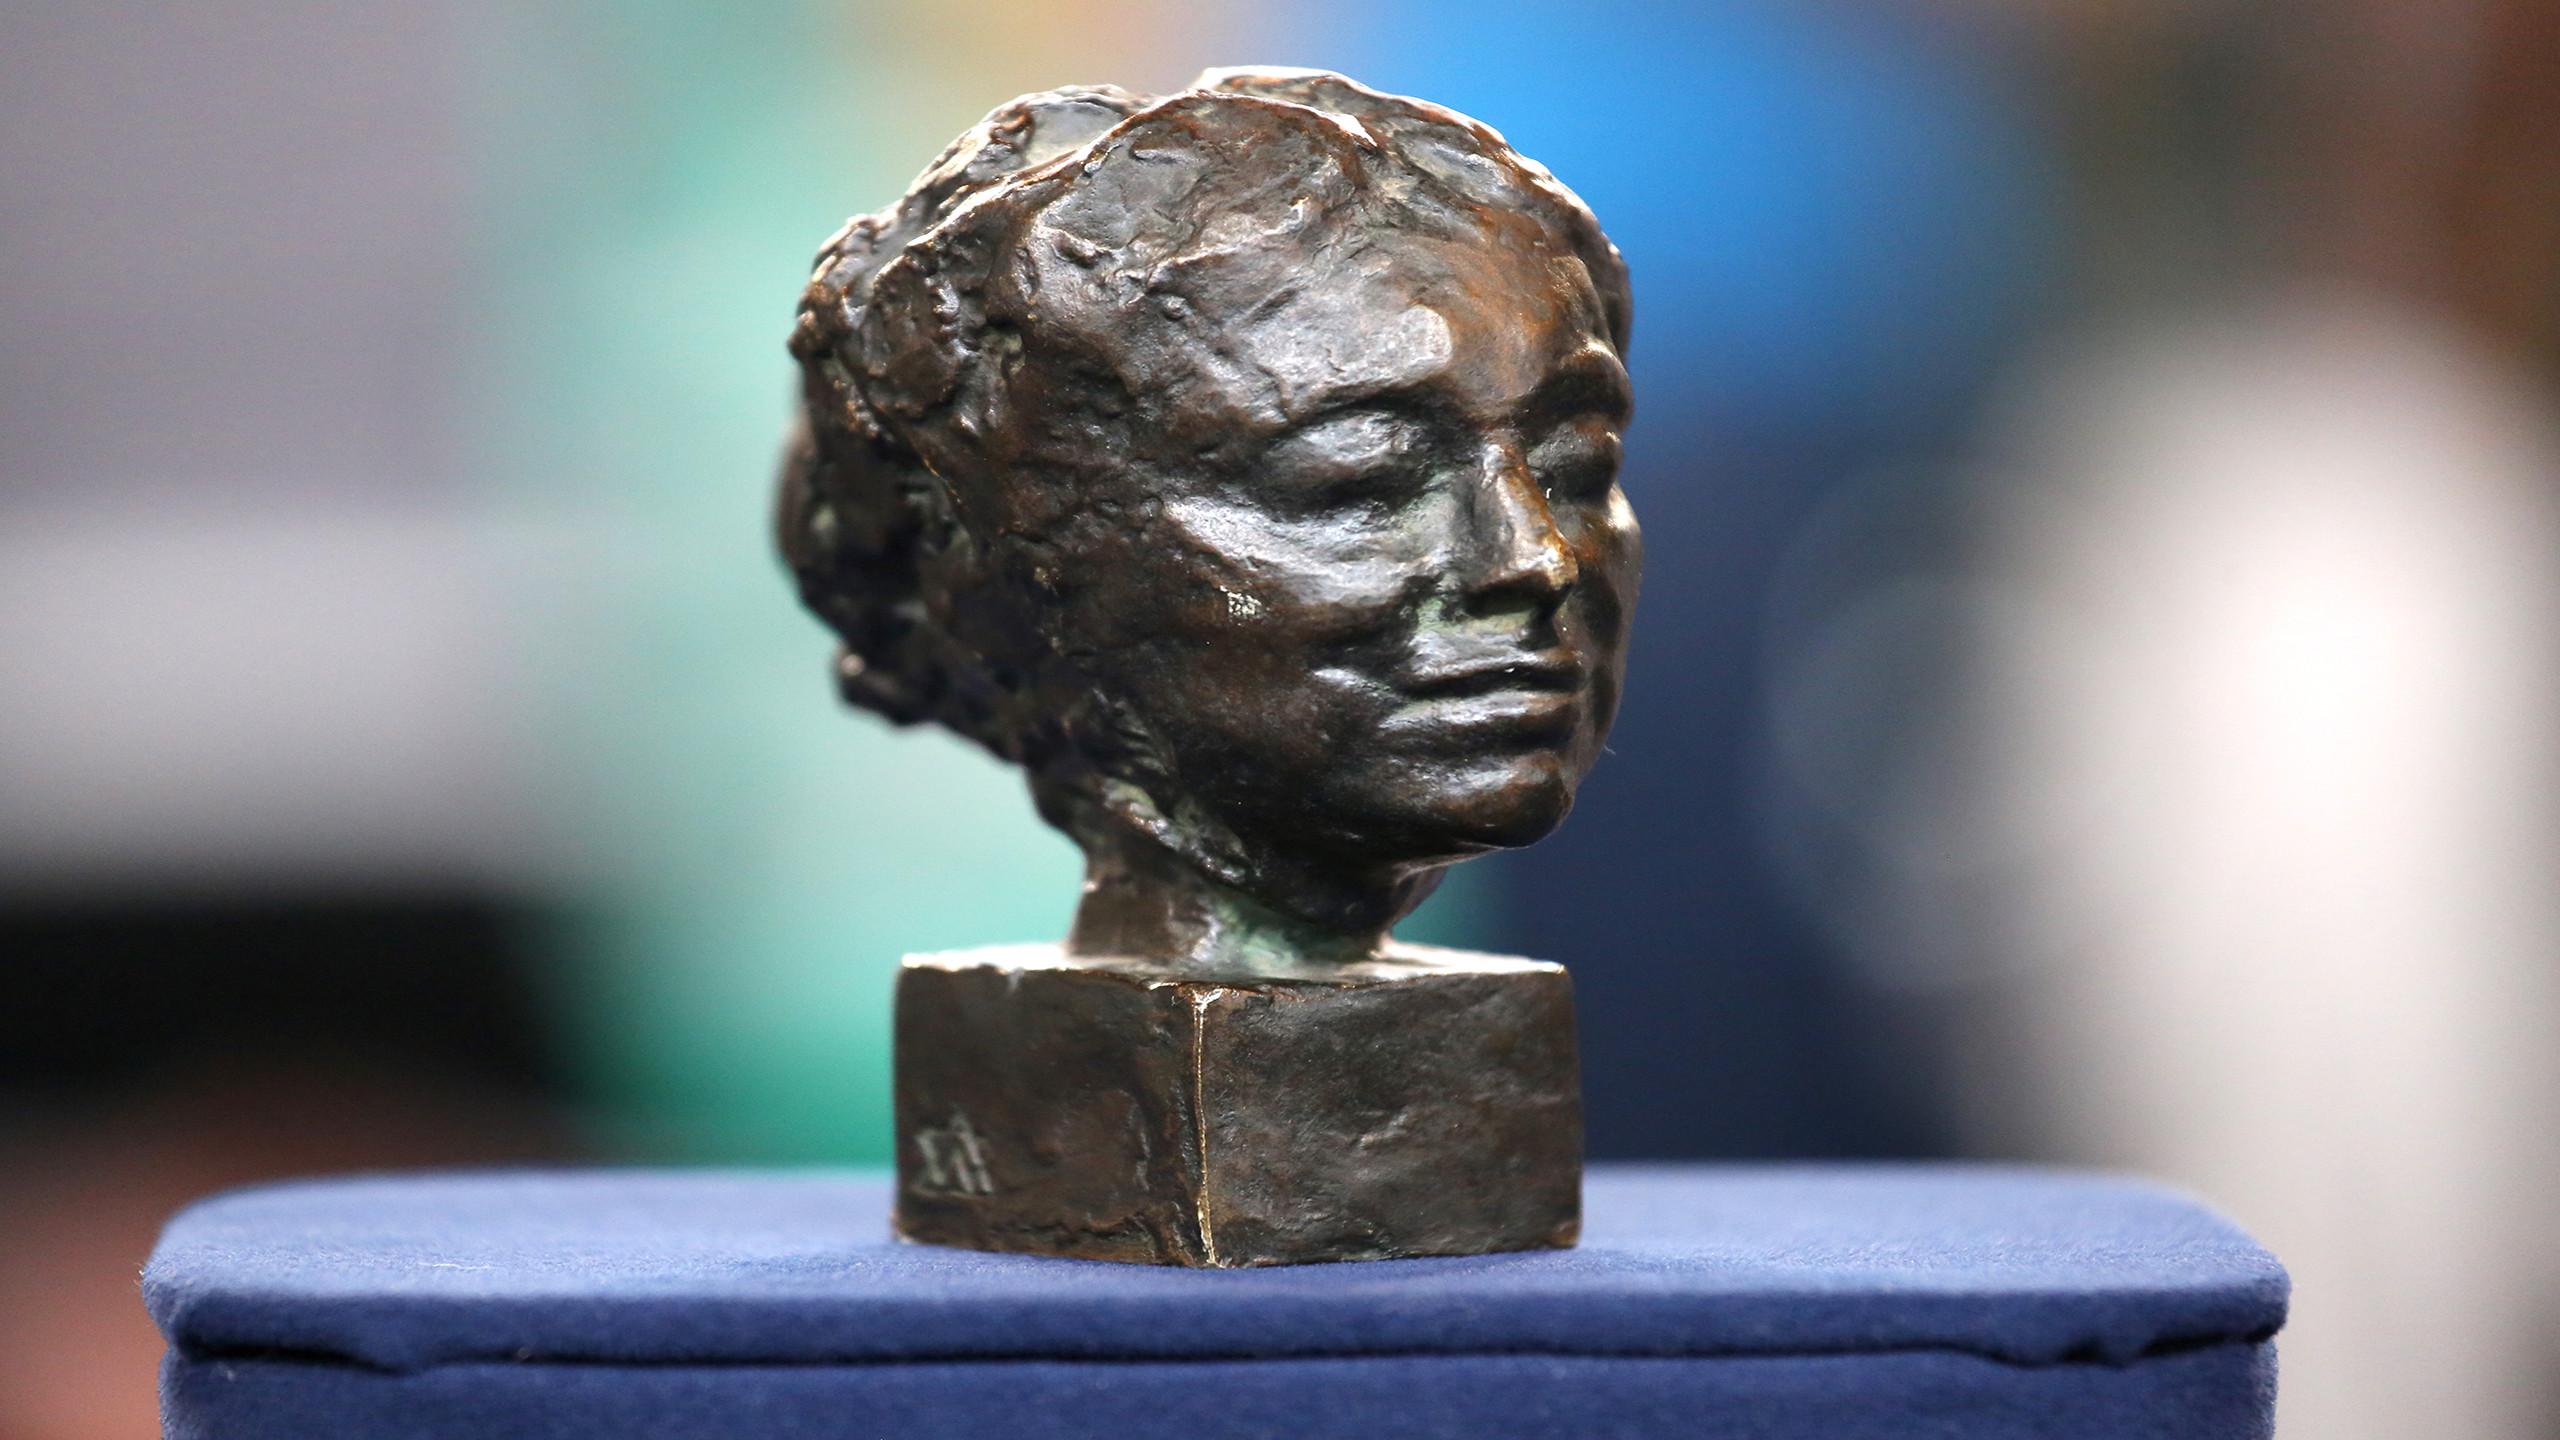 fake lady head vases of antiques roadshow appraisal antoine bourdelle bronze head ca intended for appraisal antoine bourdelle bronze head ca 1900